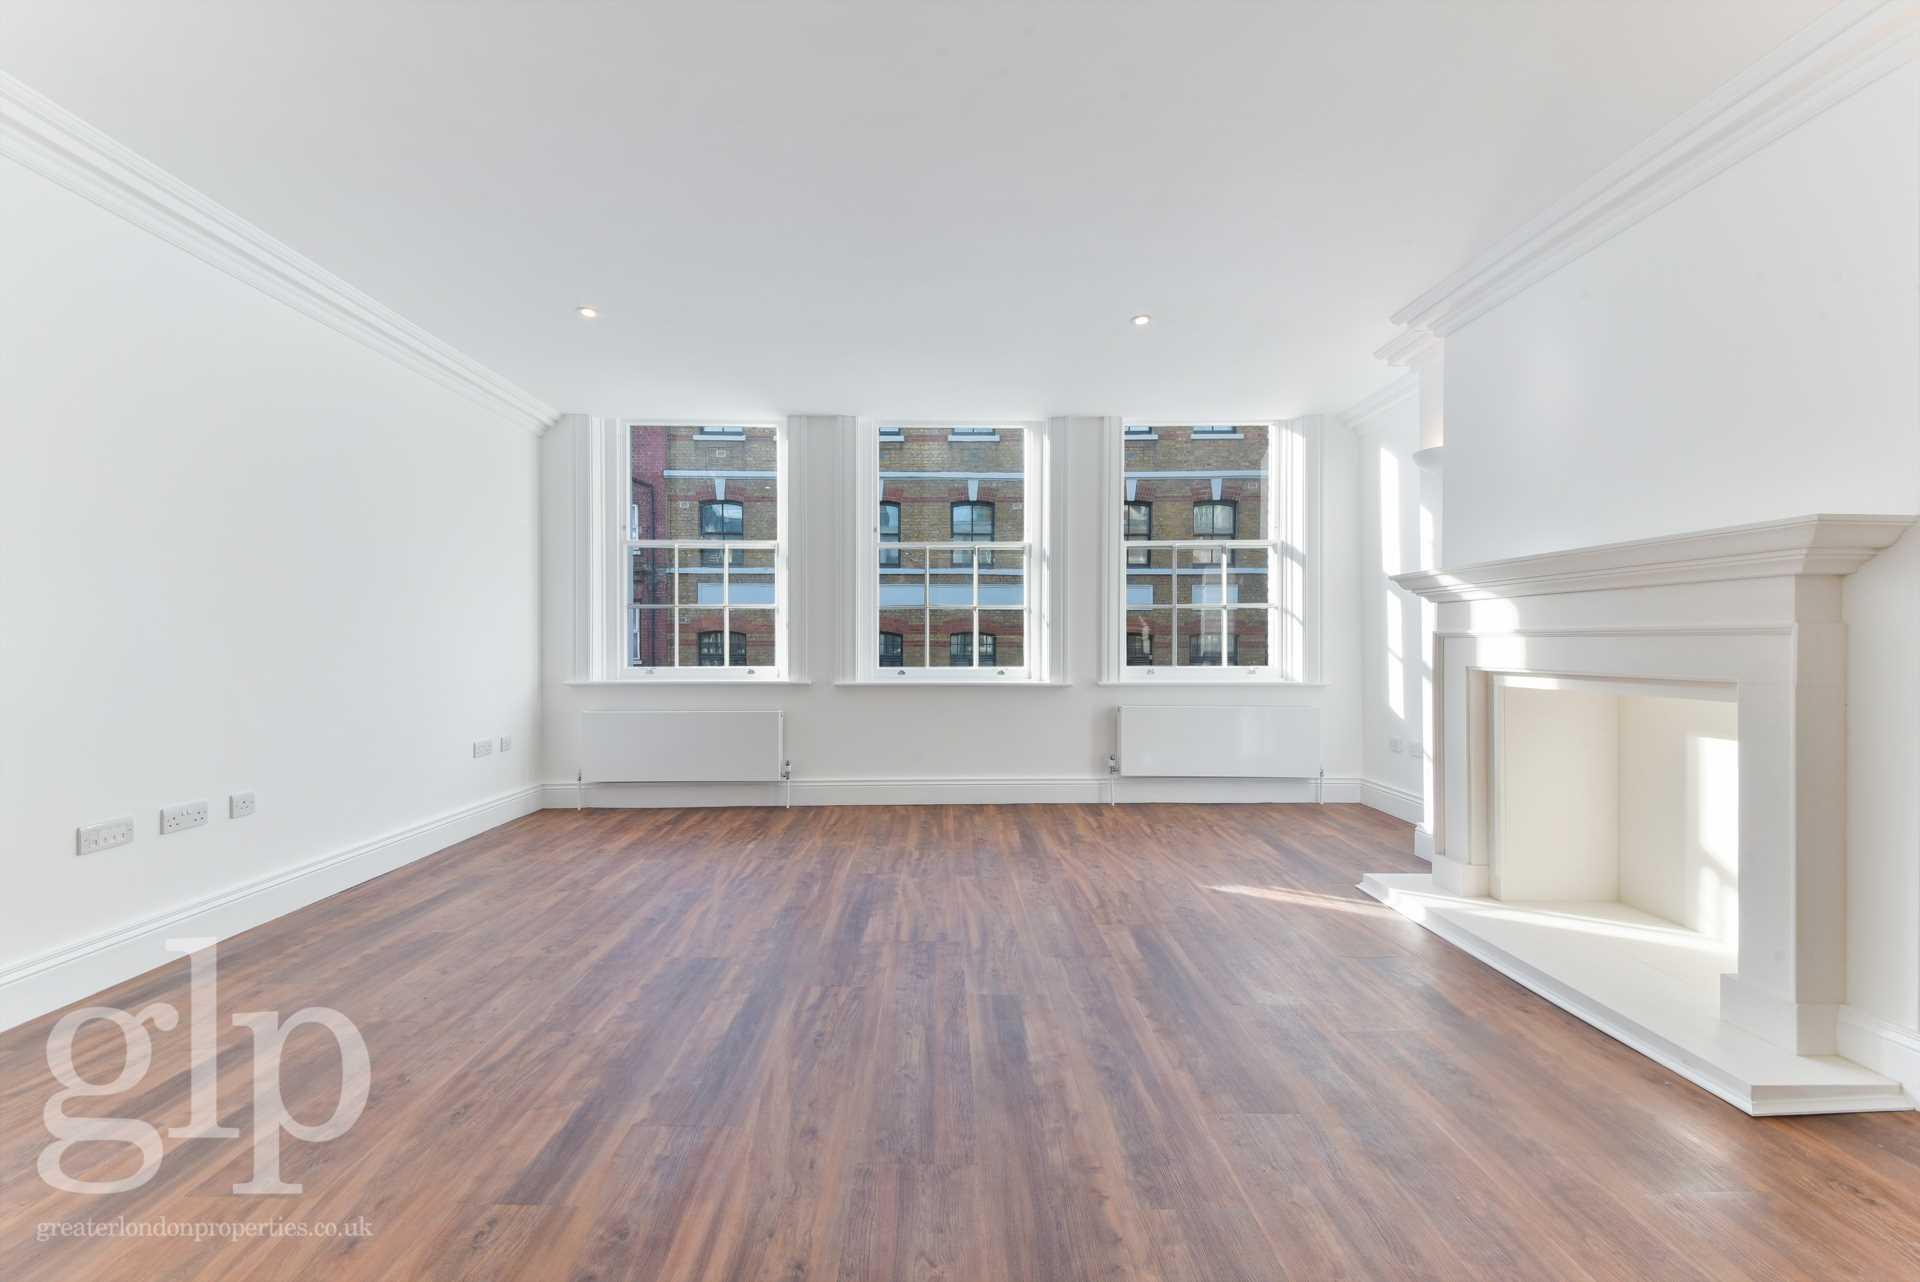 1 Bedroom Flat To Rent Second Floor Flat Greek Street Soho London W1d 4de